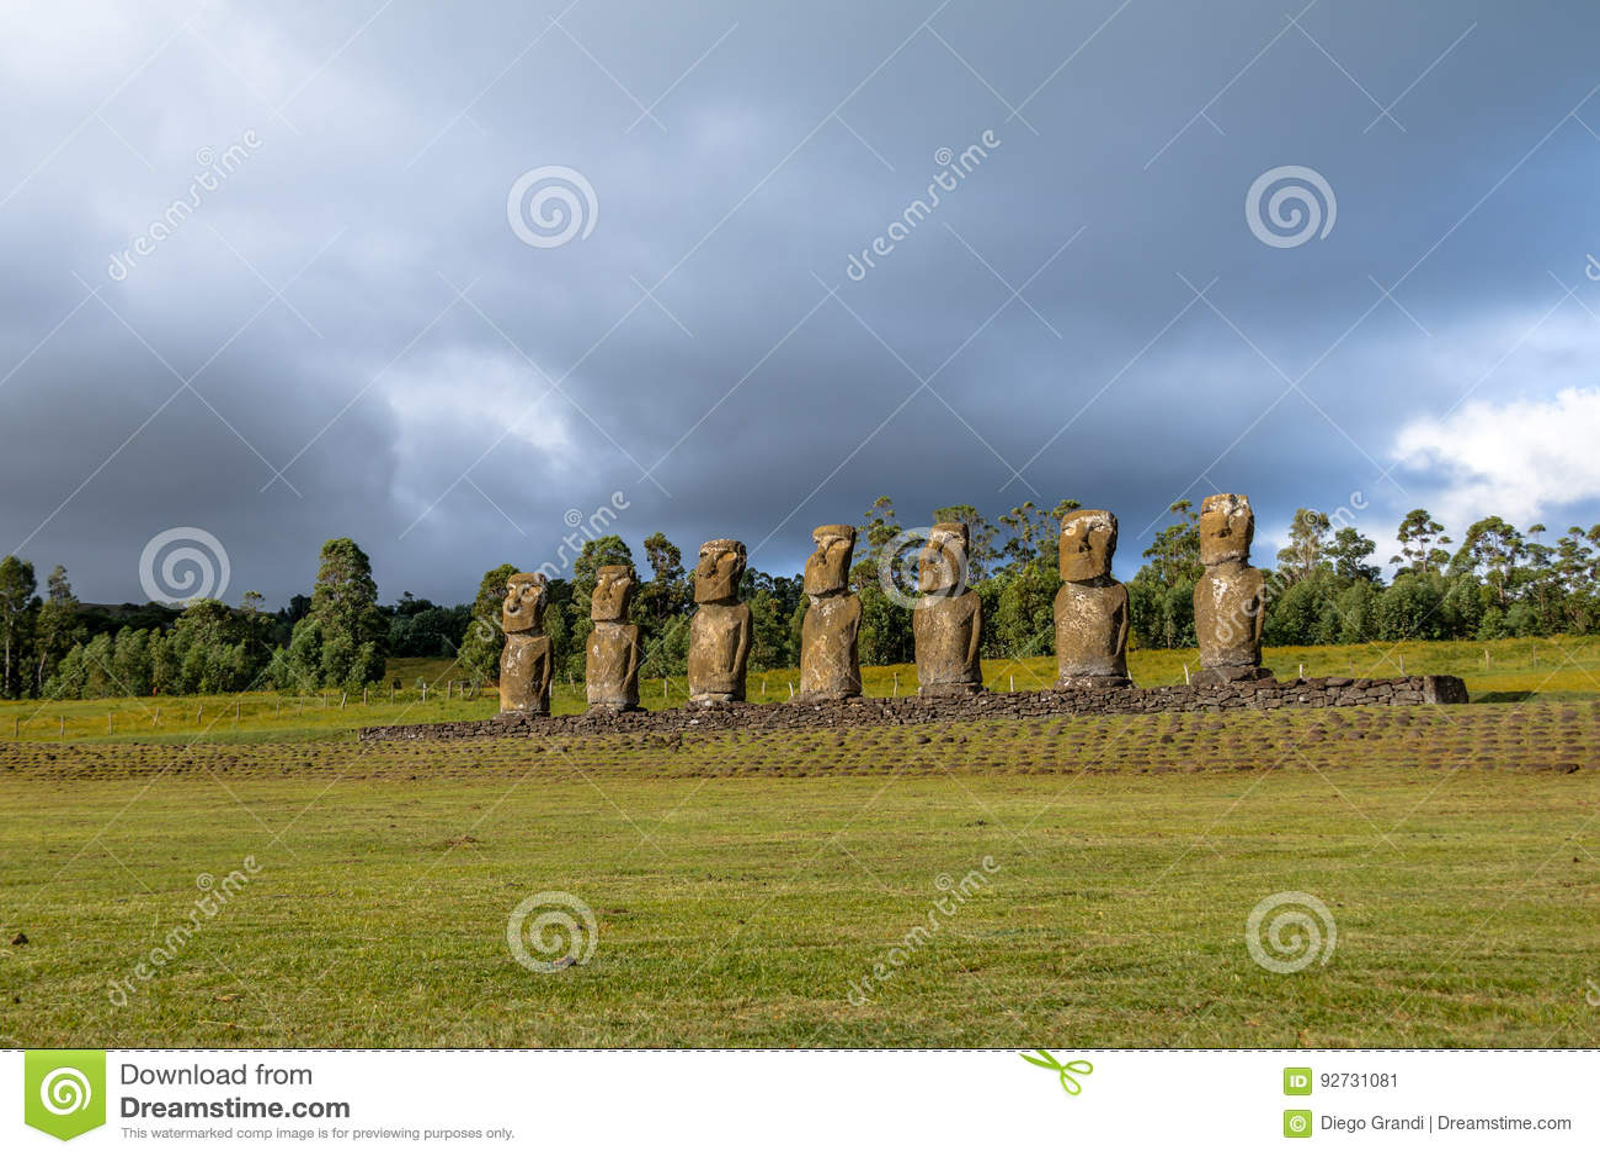 Moai Statues of Ahu Akivi, the only Moai facing the ocean - Easter Island, Chile